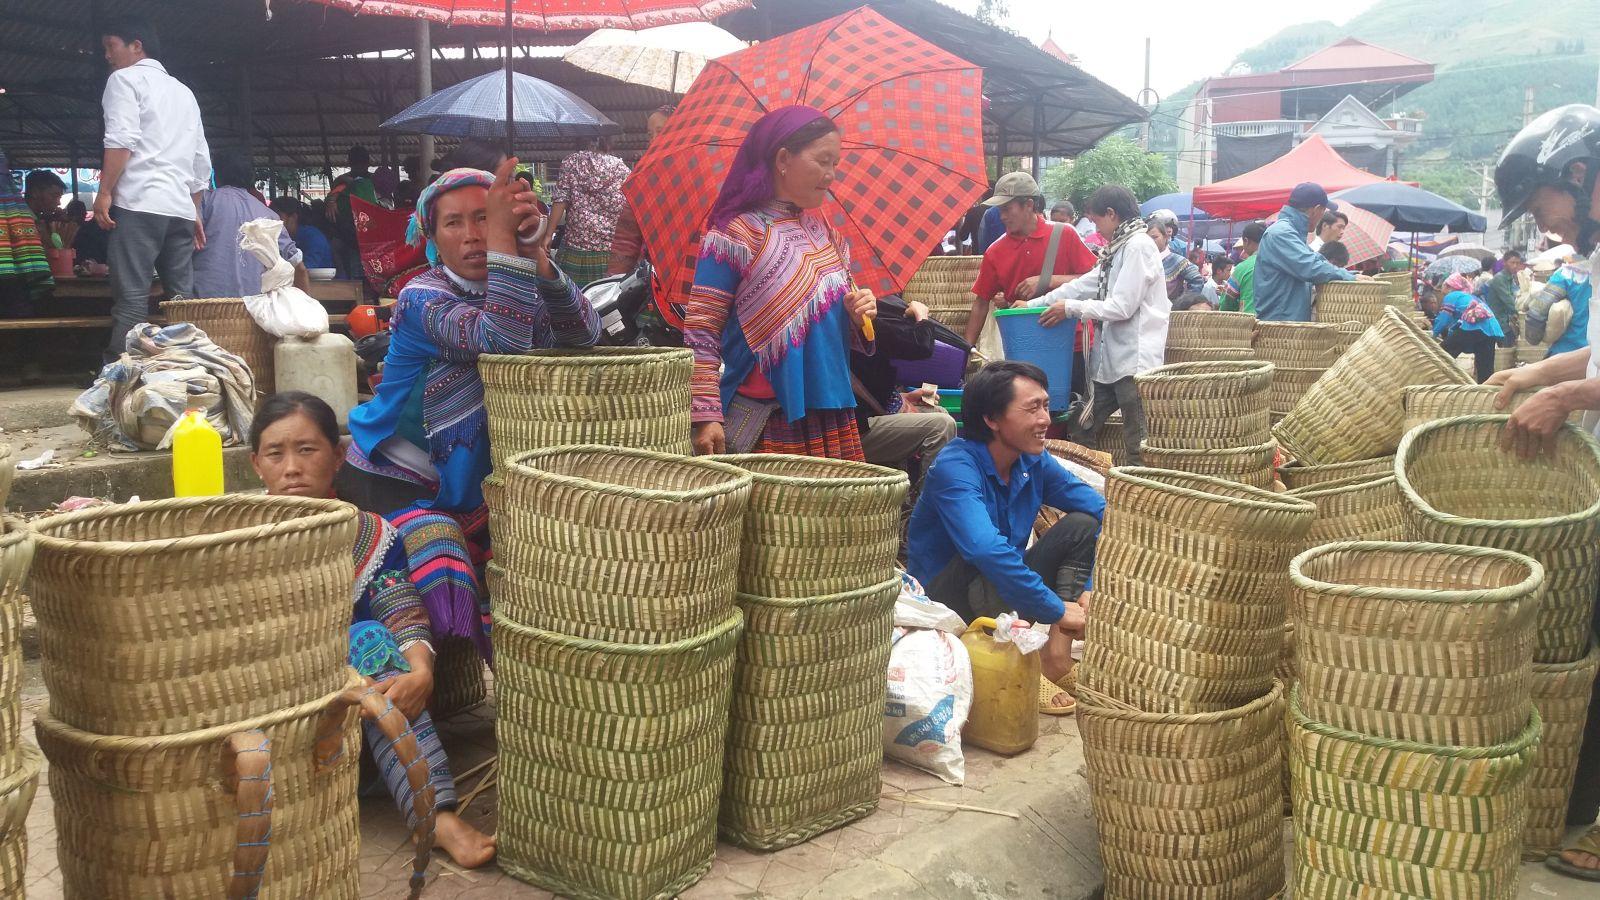 Bac Ha Market- Basket zone